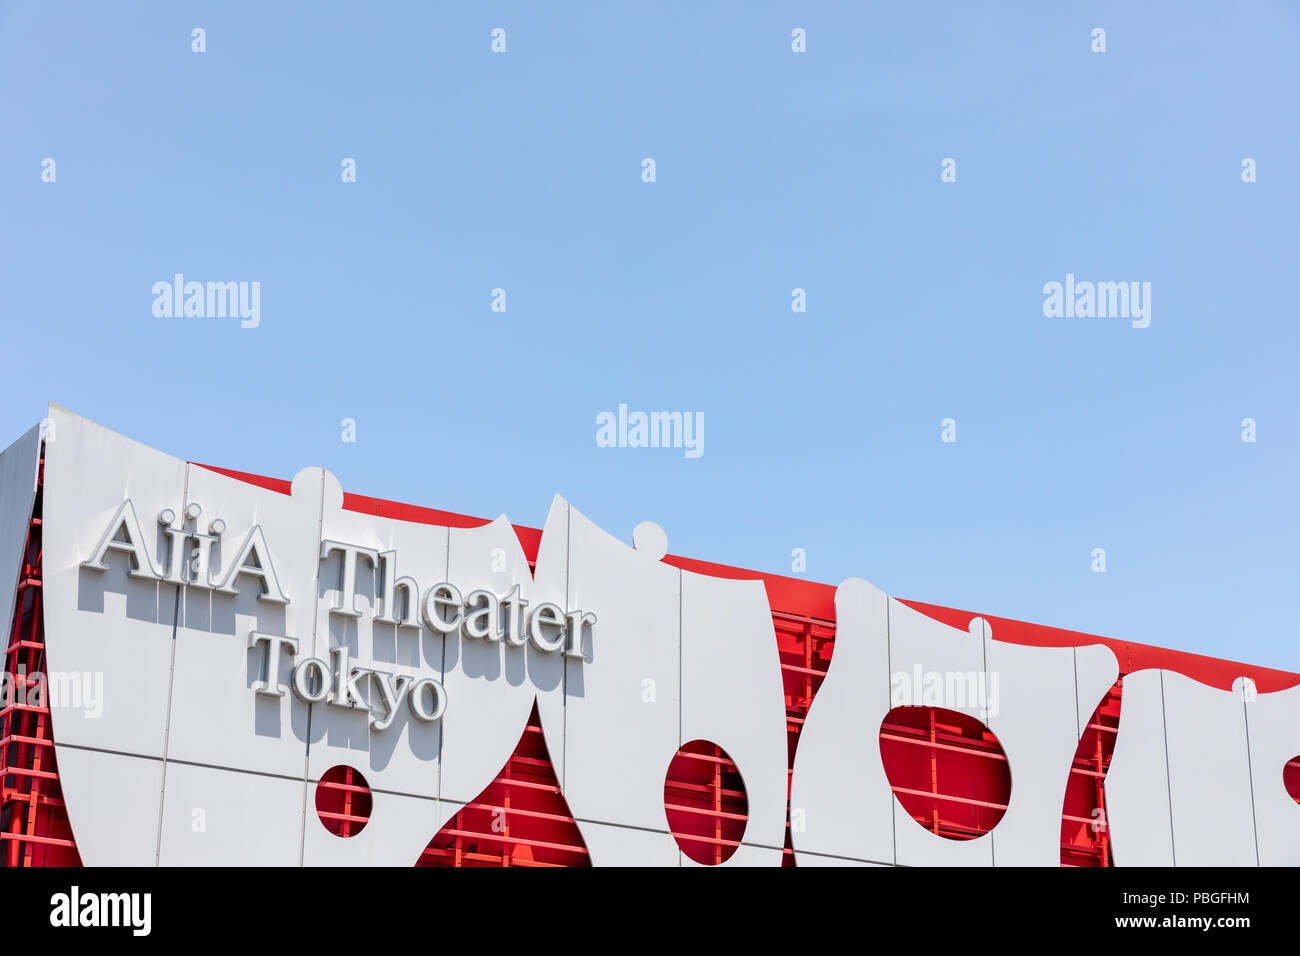 AiiA Theater Tokyo; Shibuya, Tokyo, JapanStock Photo